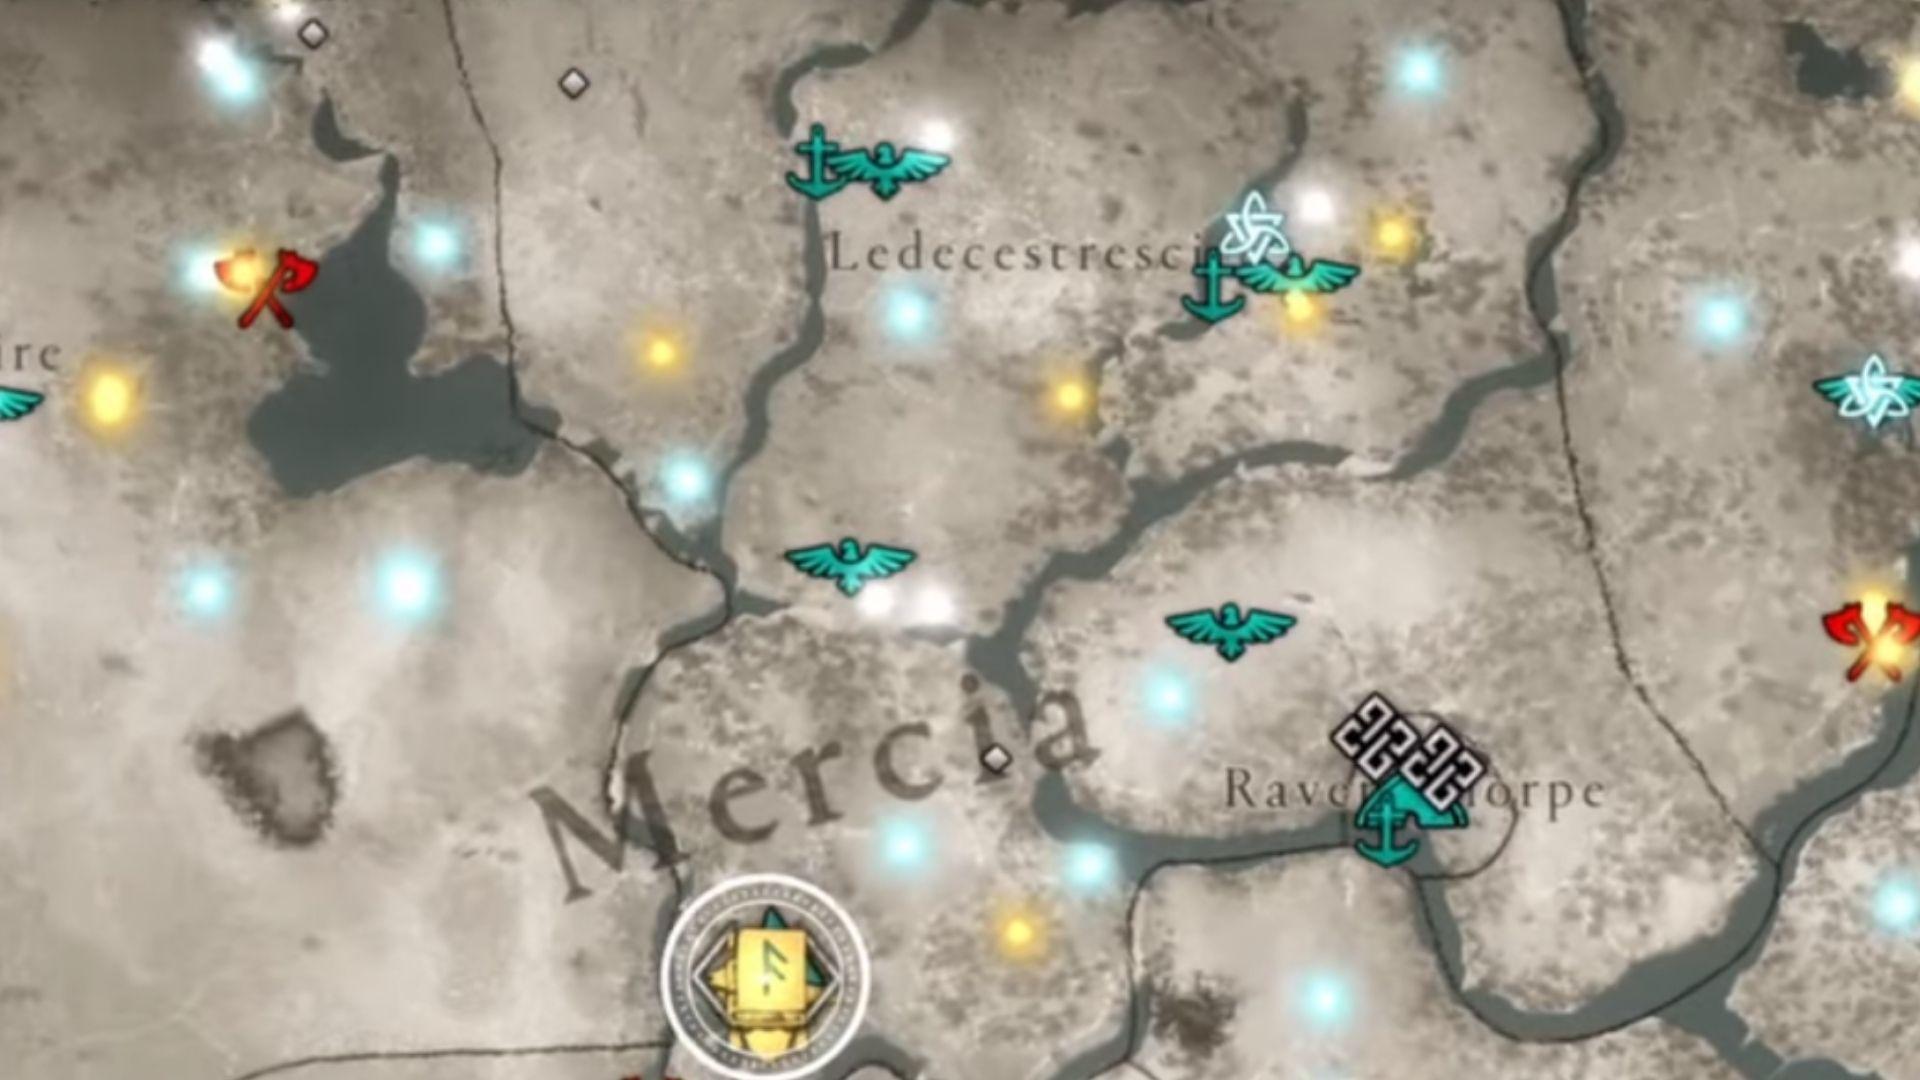 Ledecestrescire map location